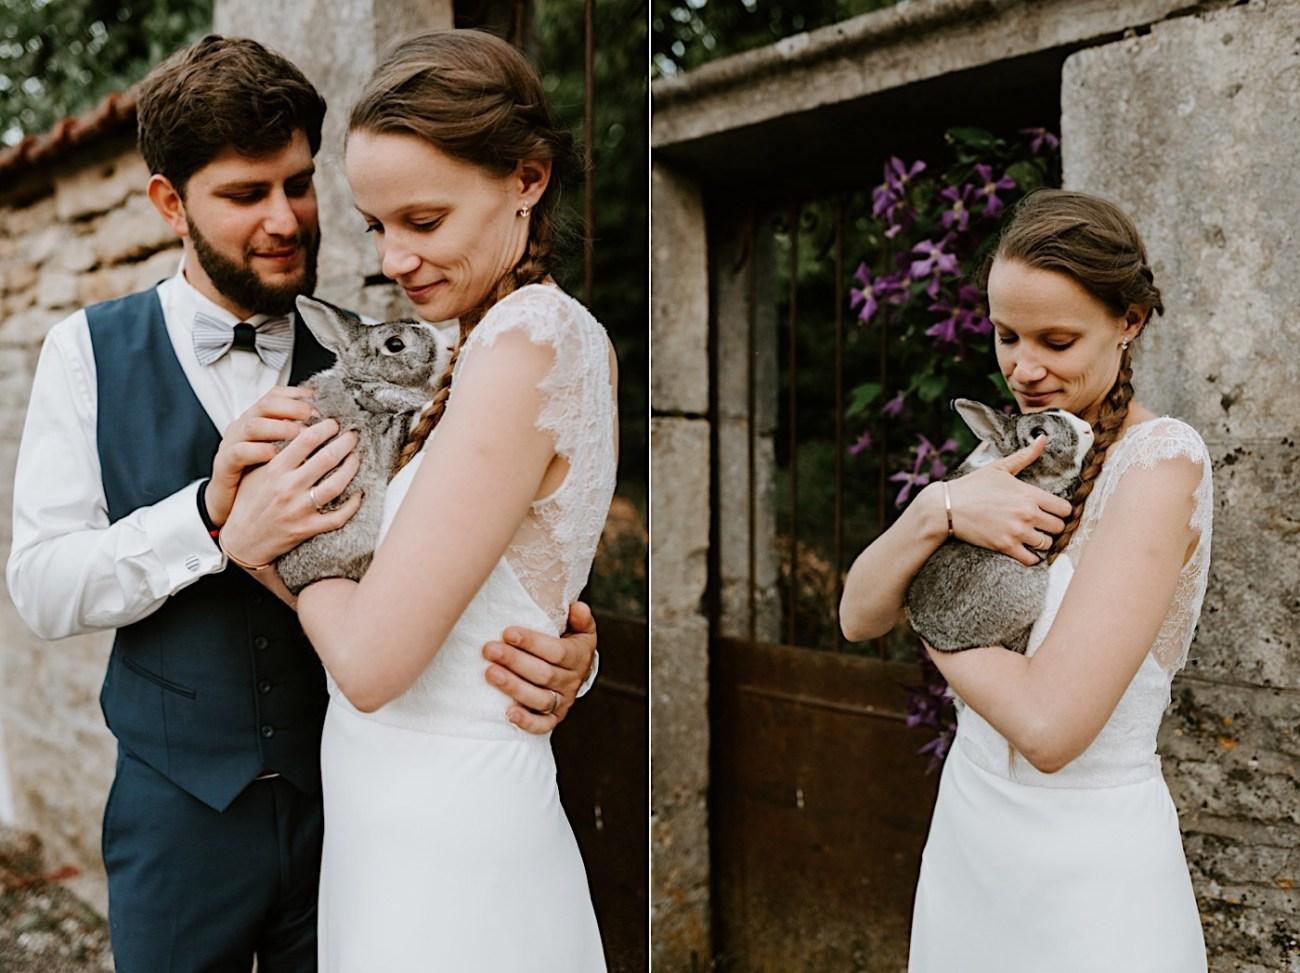 French Rural Wedding After Wedding Day Photos Paris Wedding Photographer 017